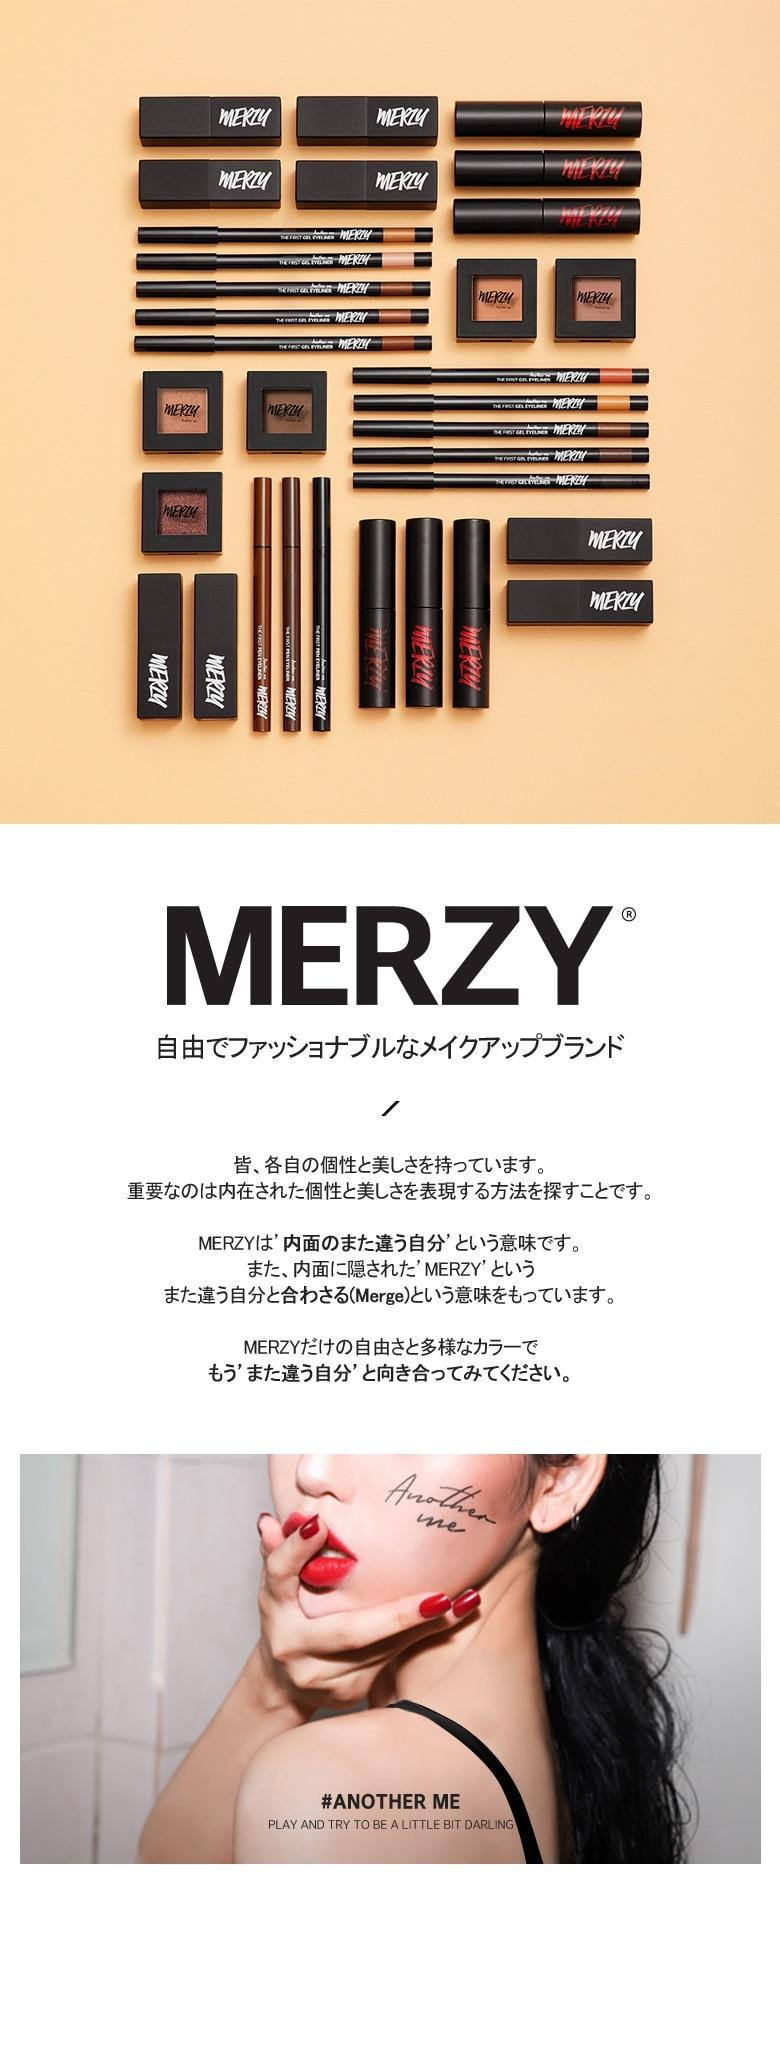 MERZYブランドについて説明